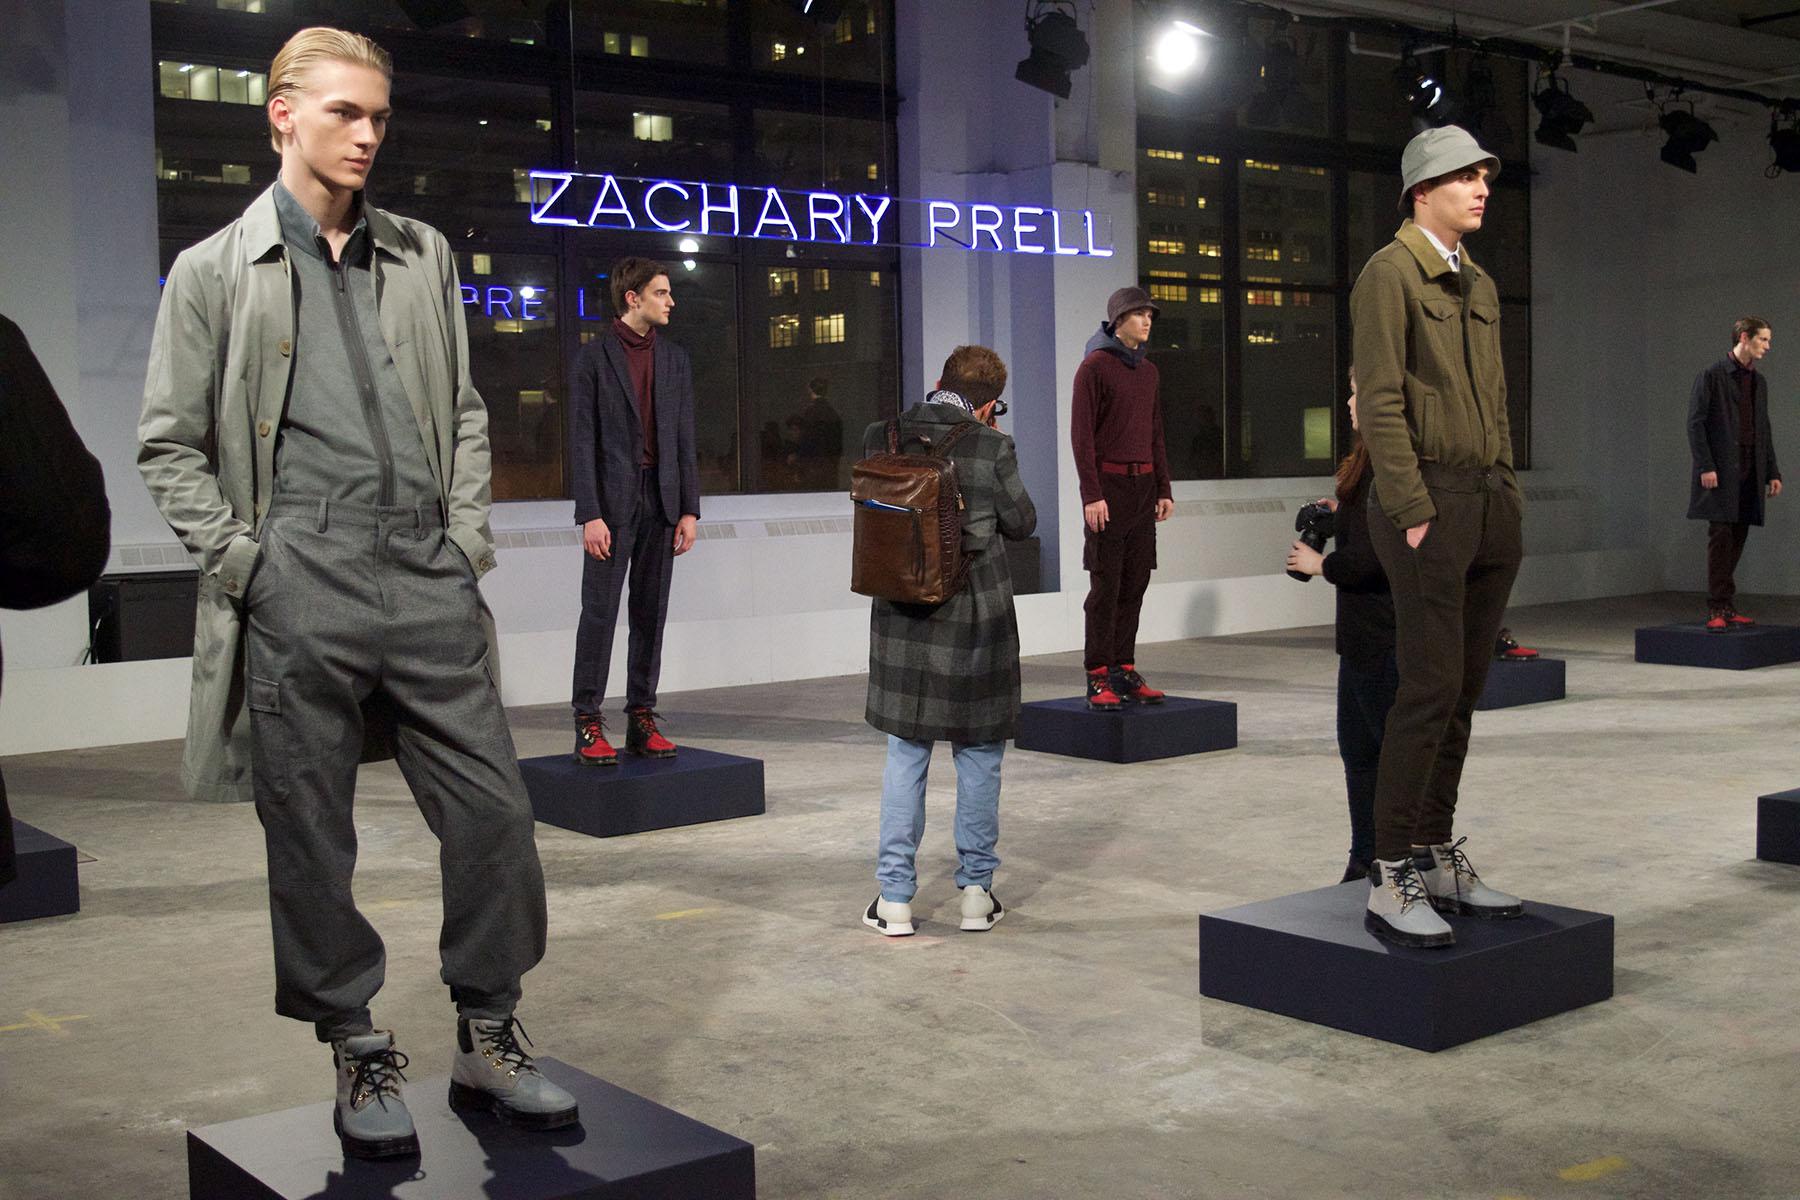 Zachary-Prell-Fall-2017-mens-fashion-show-backstage-the-impression-032